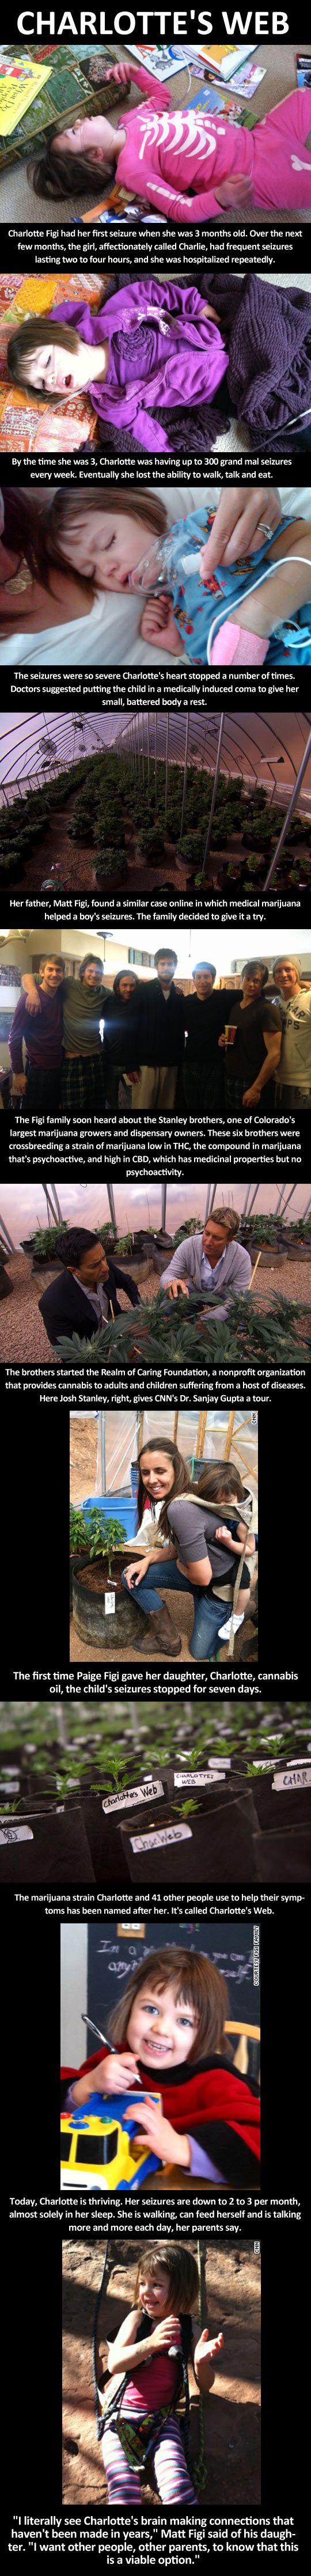 Marijuana has a place in health care.